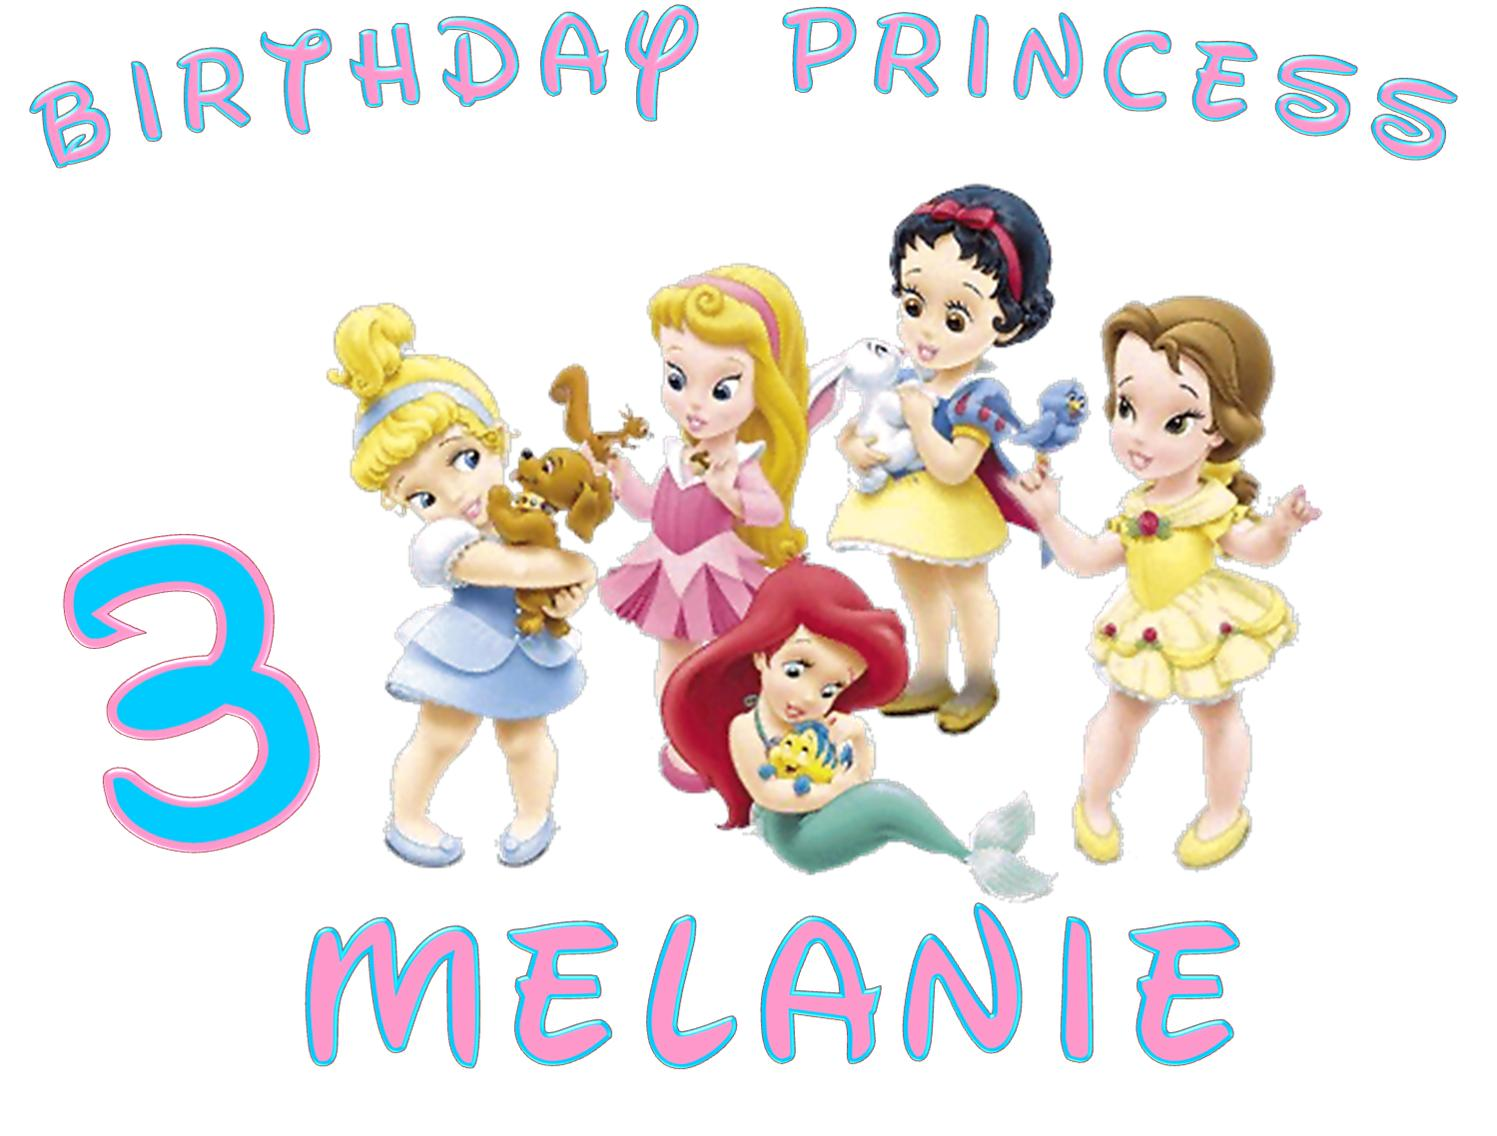 Disney Princess Toddlers | Disney princess toddler, Disney ...  |Baby Disney Princess